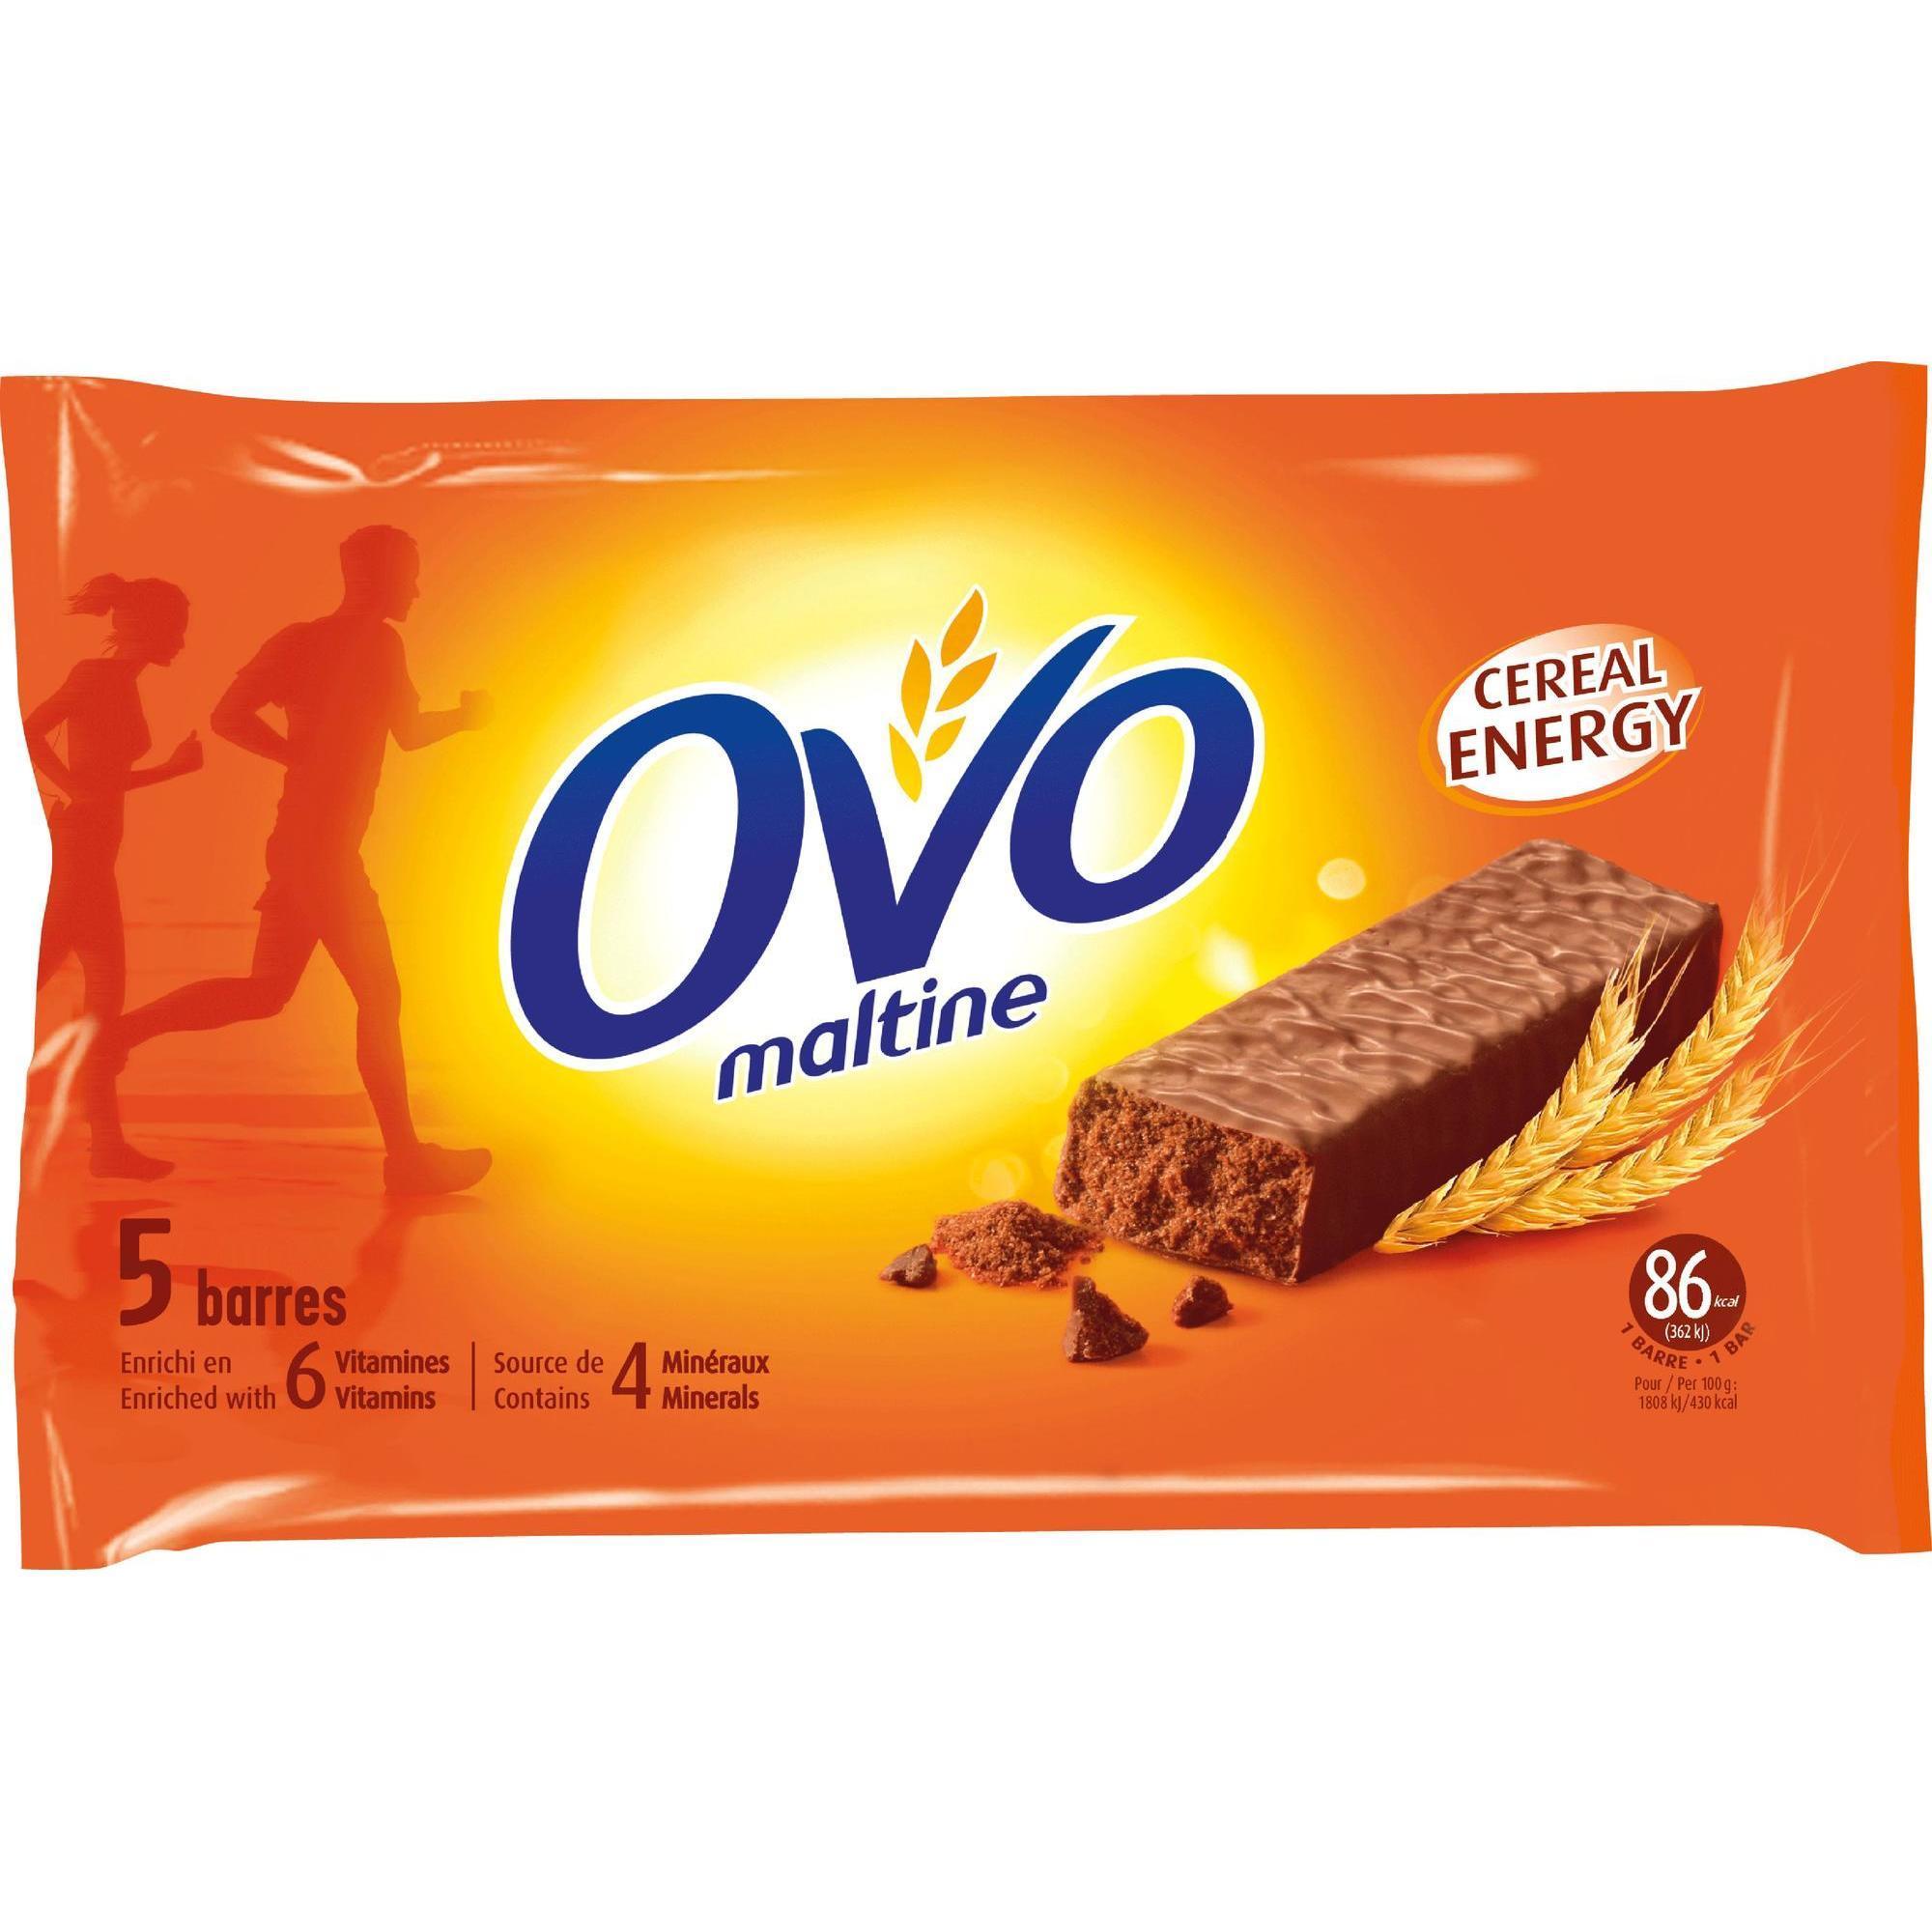 Energy-Riegel Ovomaltine Schokolade 5 נ20 g